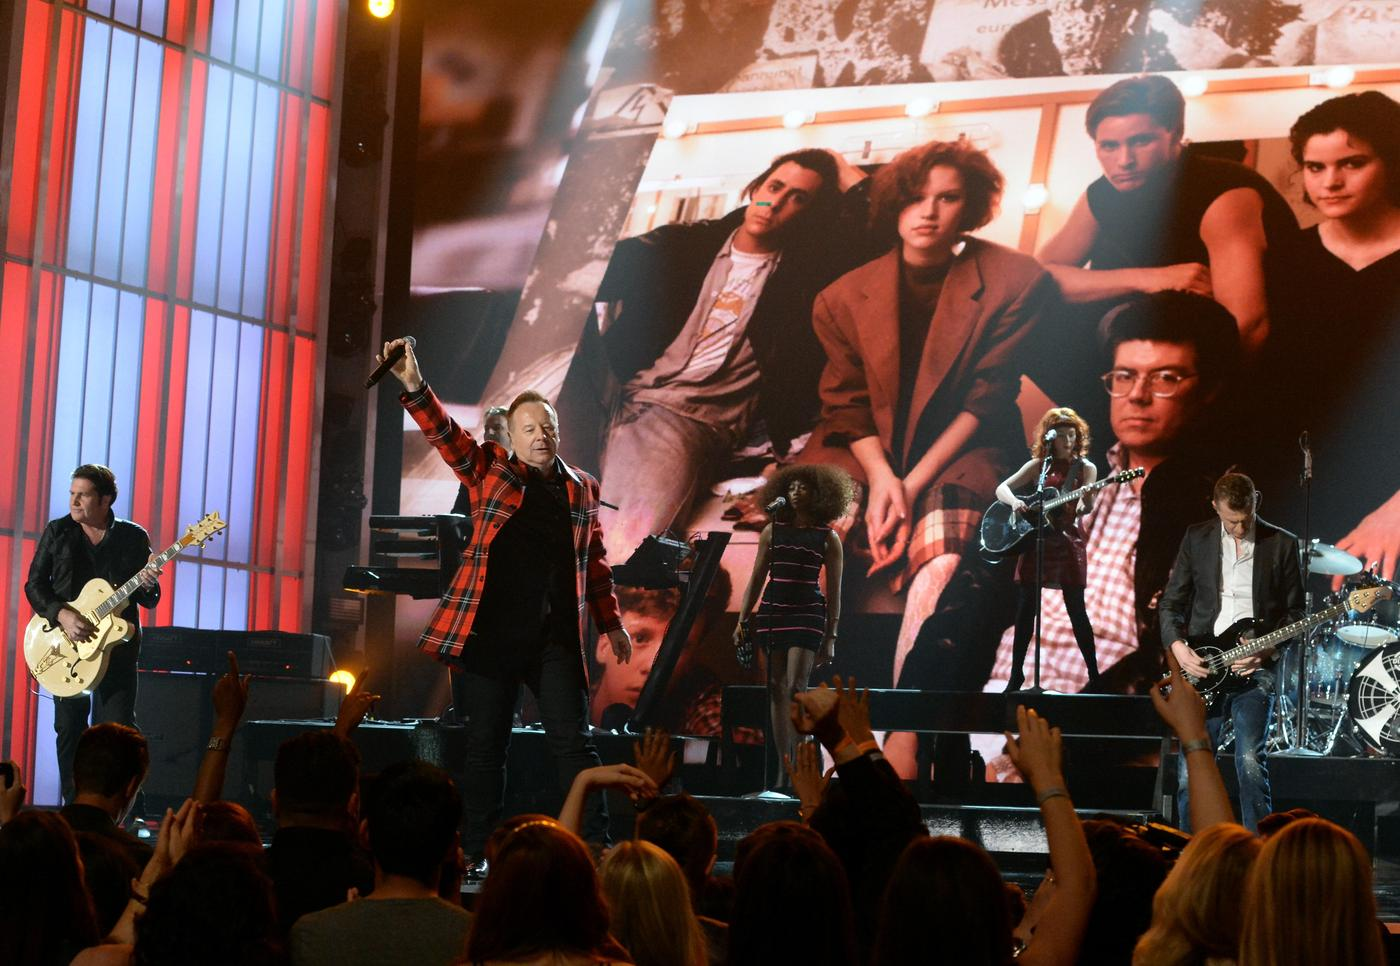 Simple Minds 2015 Billboard Music Awards - Roaming Show Jeff Kravitz/BMA2015/FilmMagic